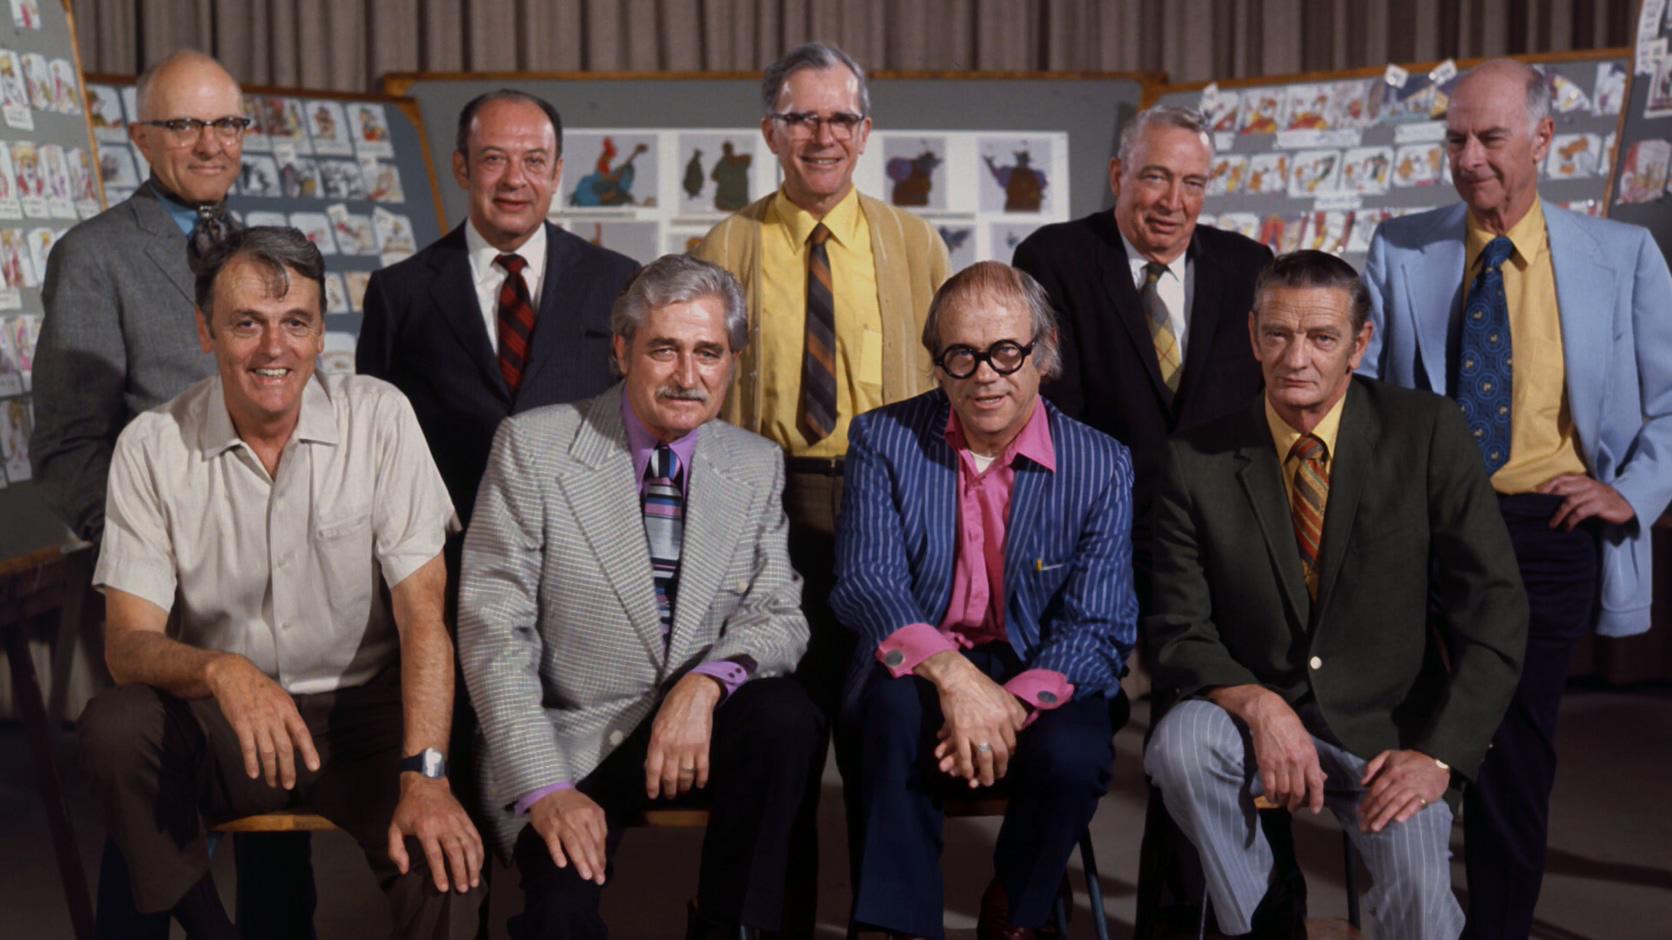 Disney's Nine Old Men